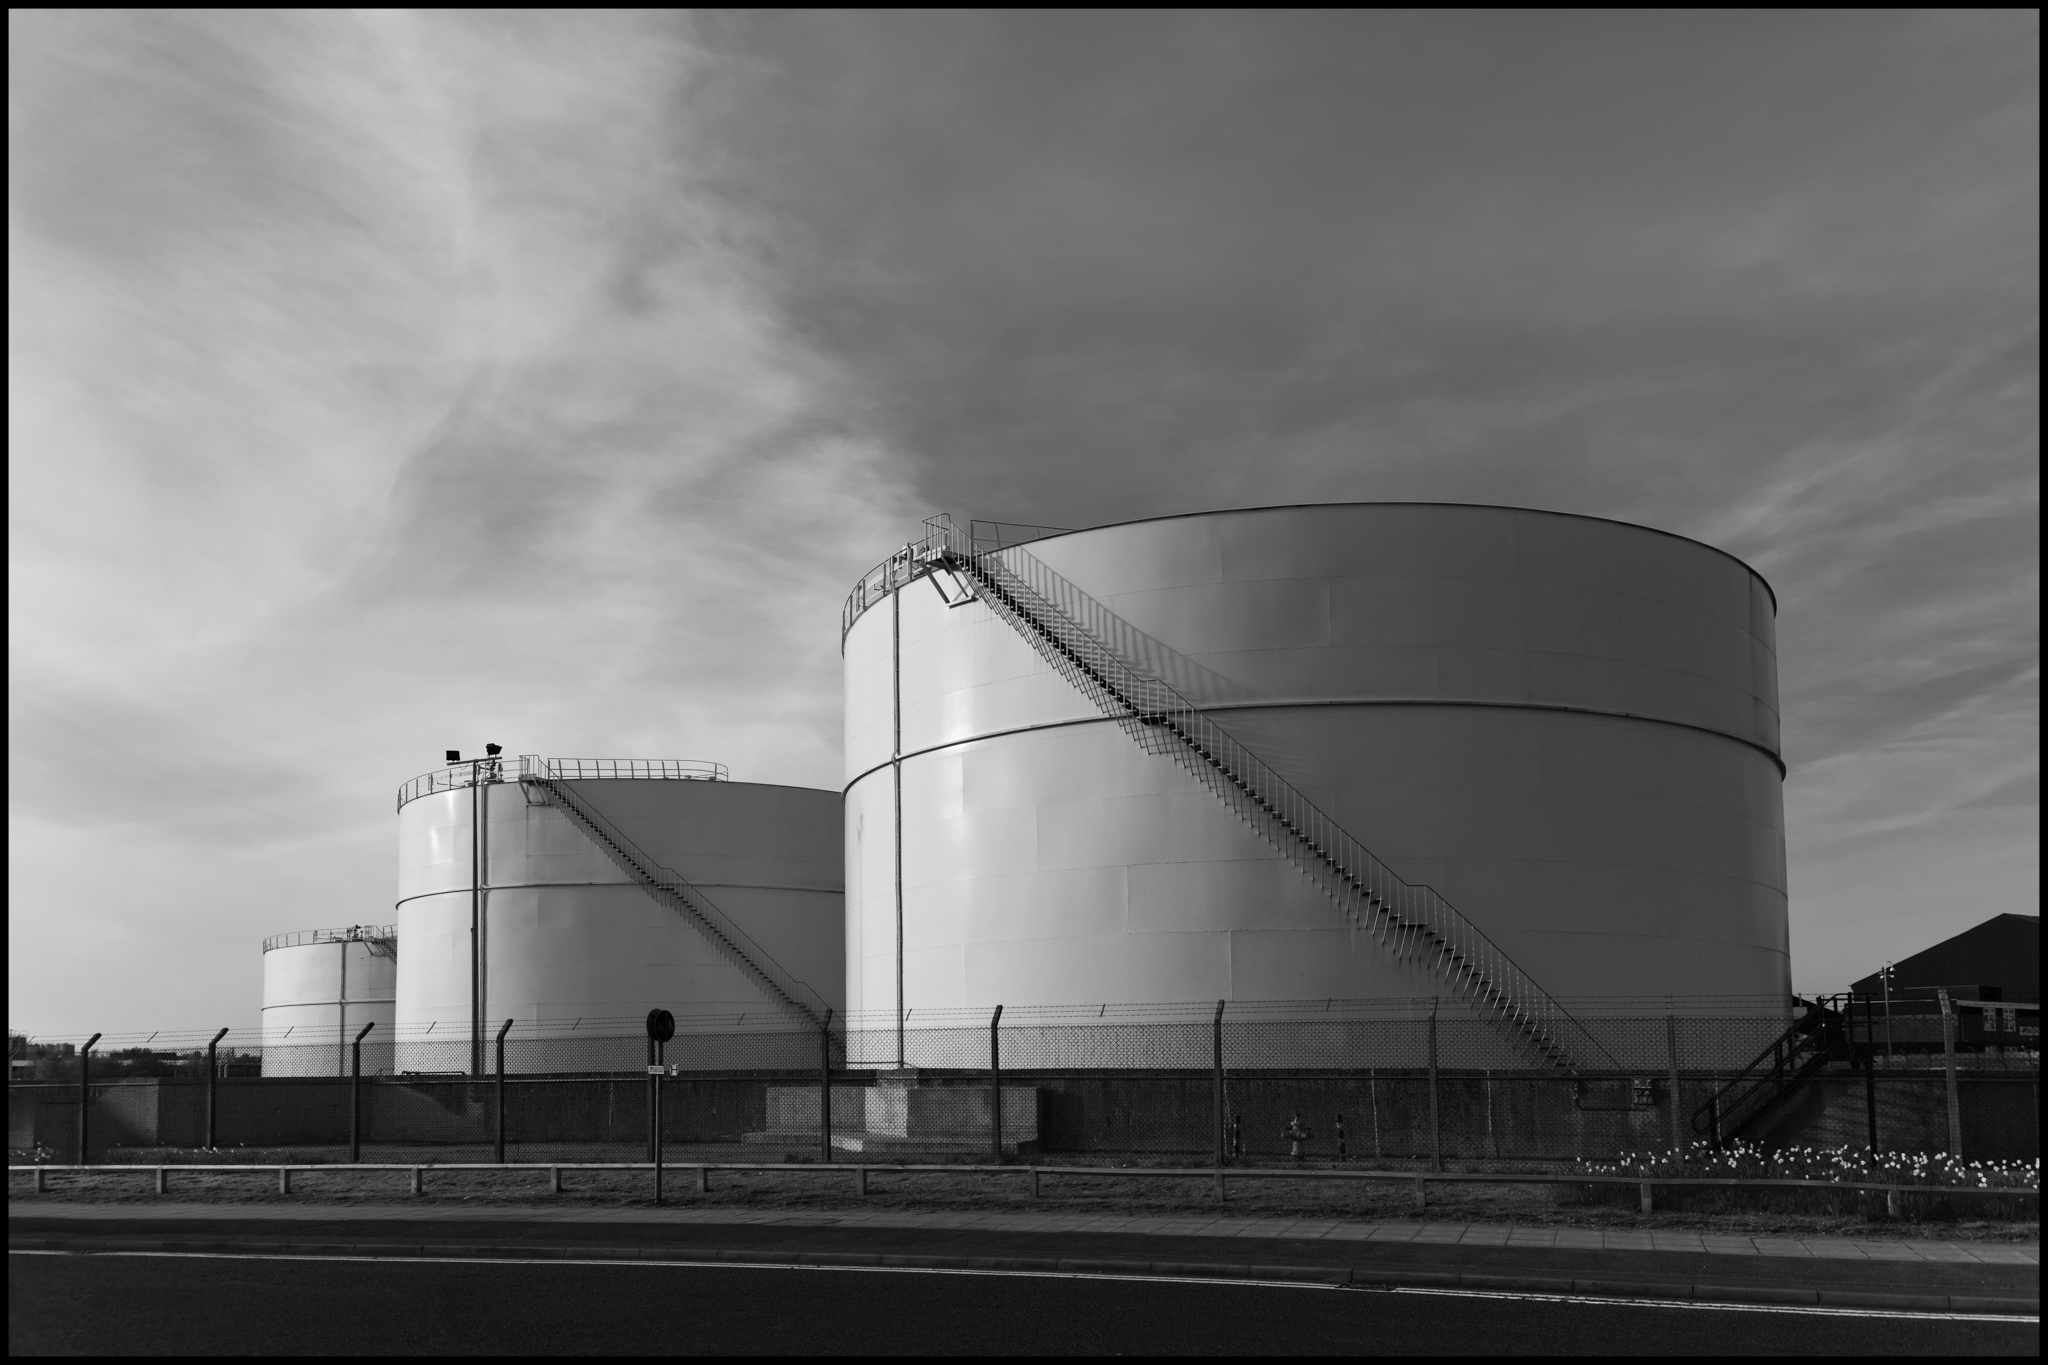 21 April 2019 - Gas holders, Manchester UK